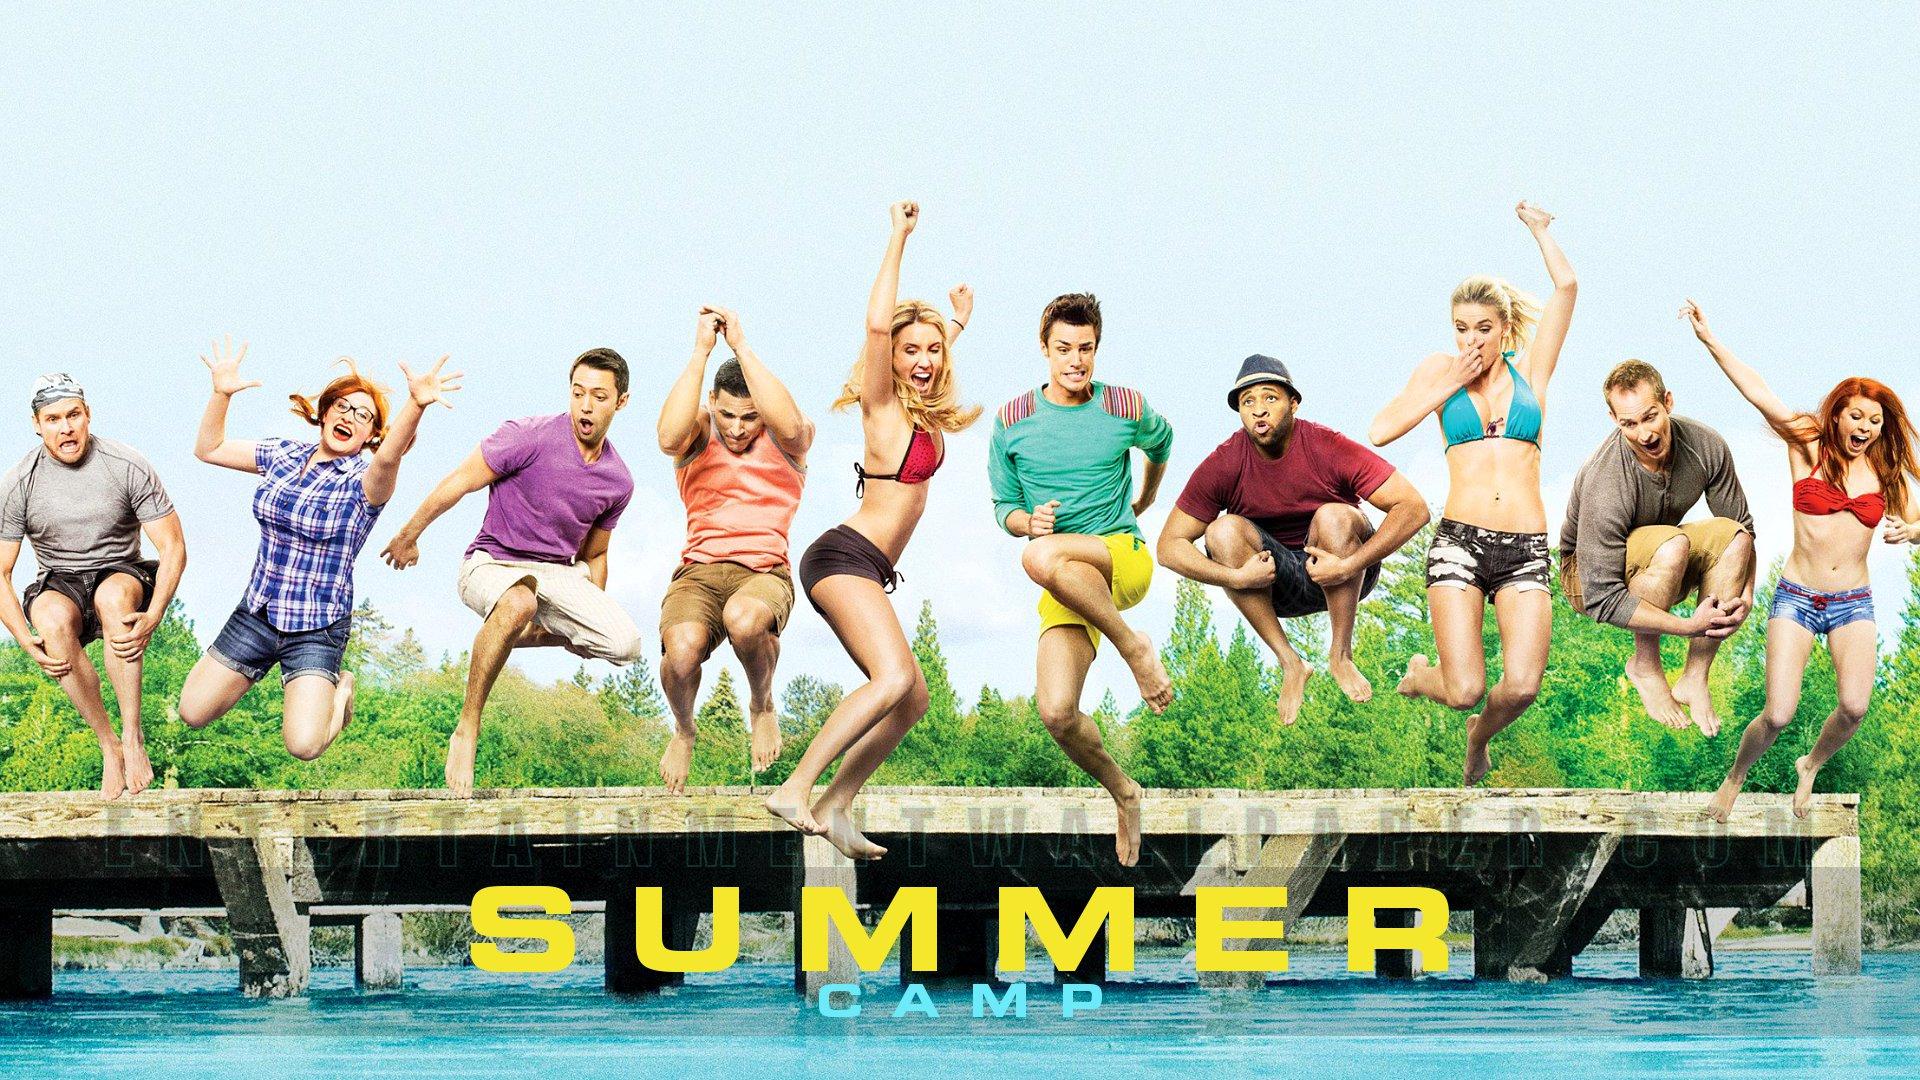 summer camp wallpaper 20040983 size 1920x1080 more summer camp 1920x1080